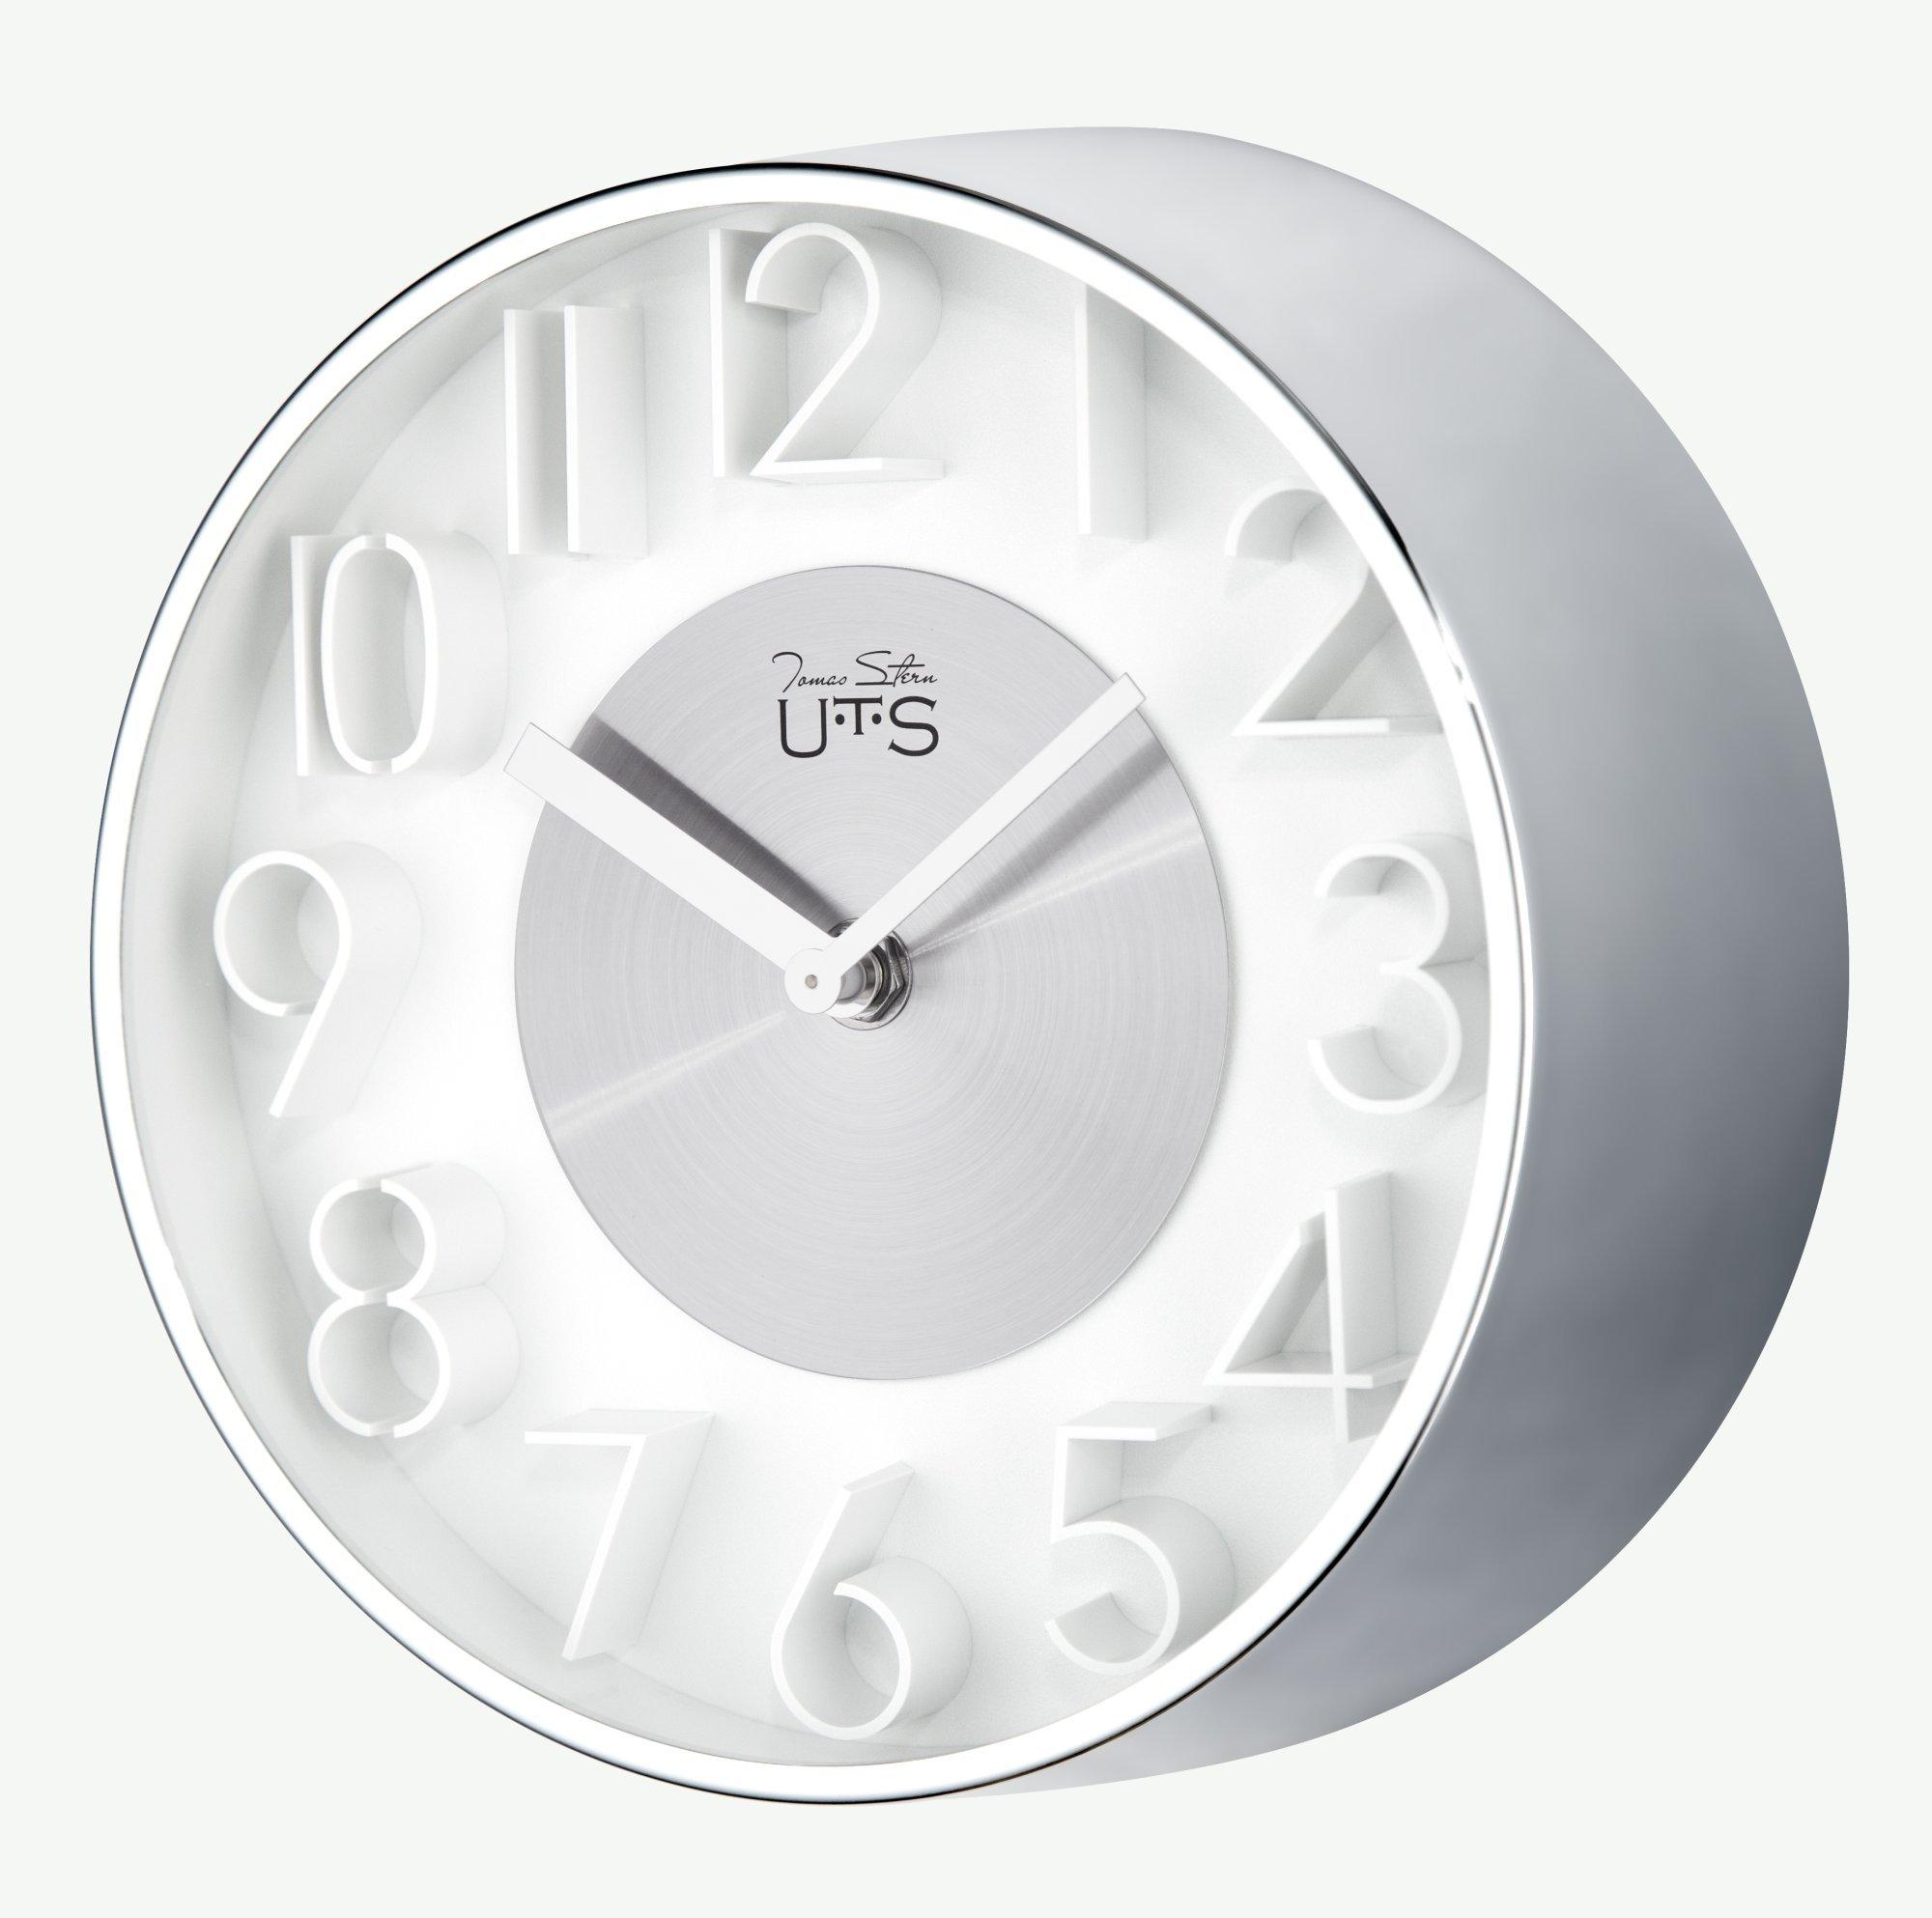 Часы настенные Часы настенные Tomas Stern 4016S chasy-nastennye-tomas-stern-4016s-germaniya.jpg